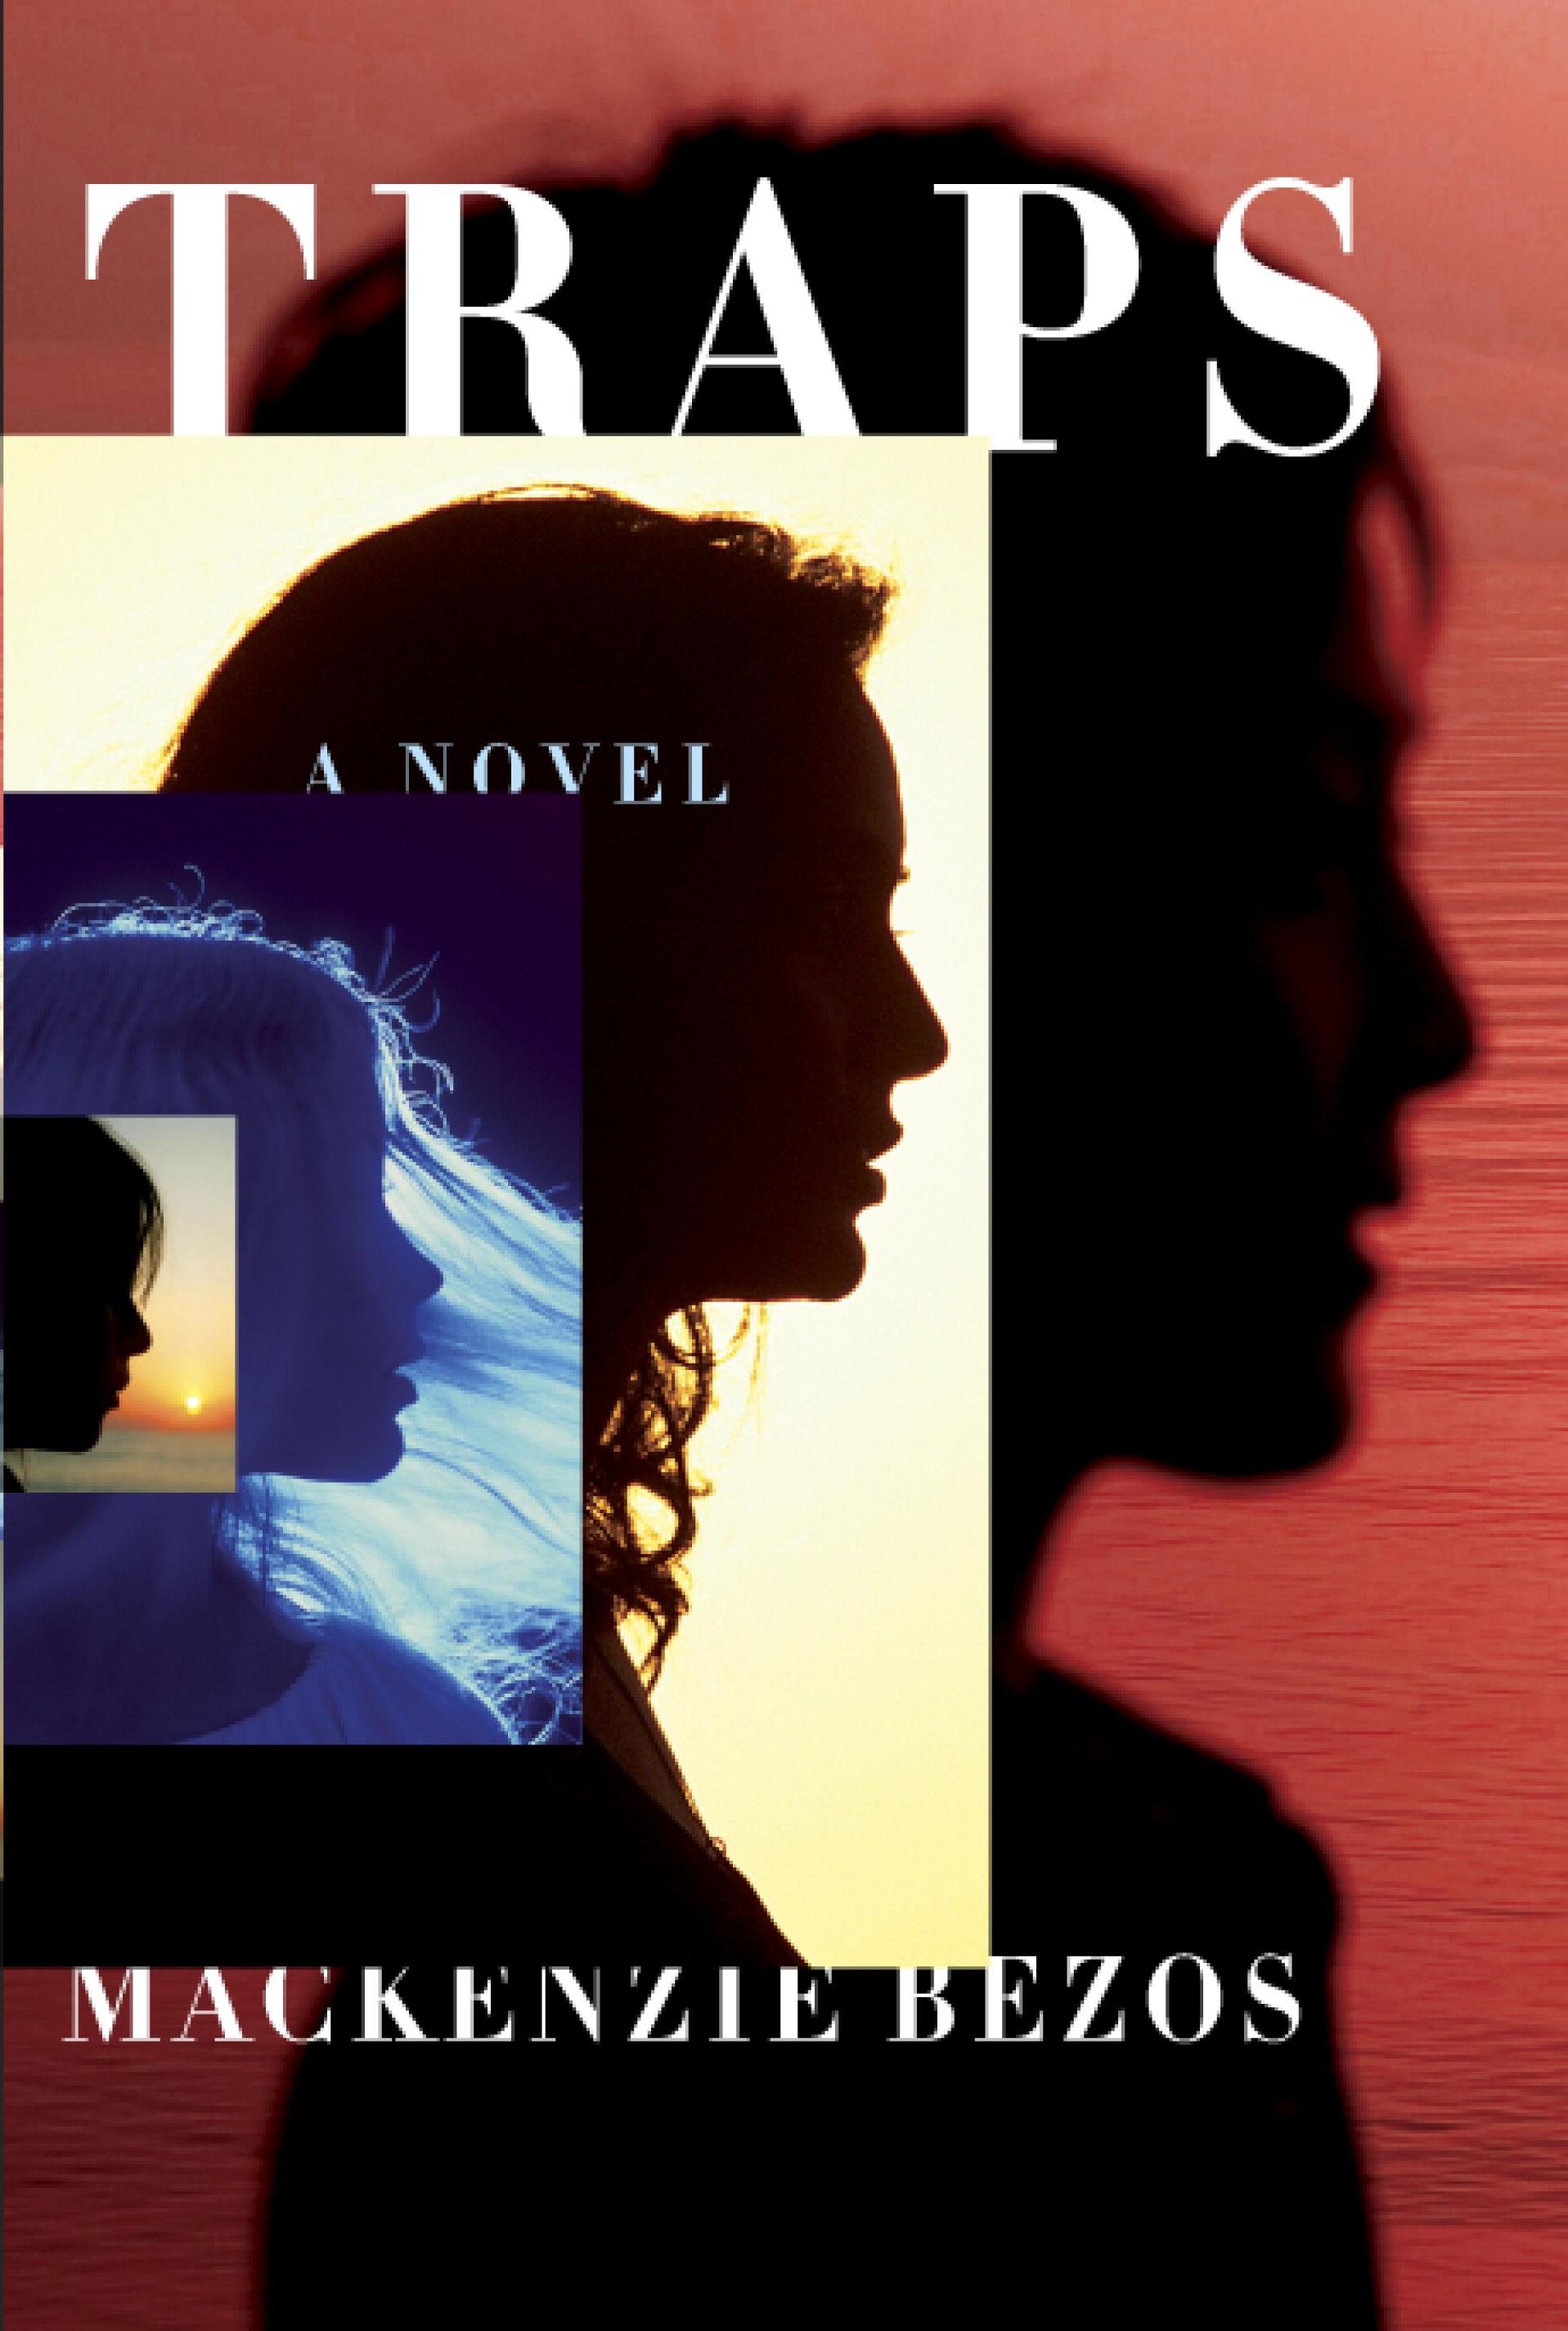 trapsbezos 12 Buzzy Books to Read This Summer